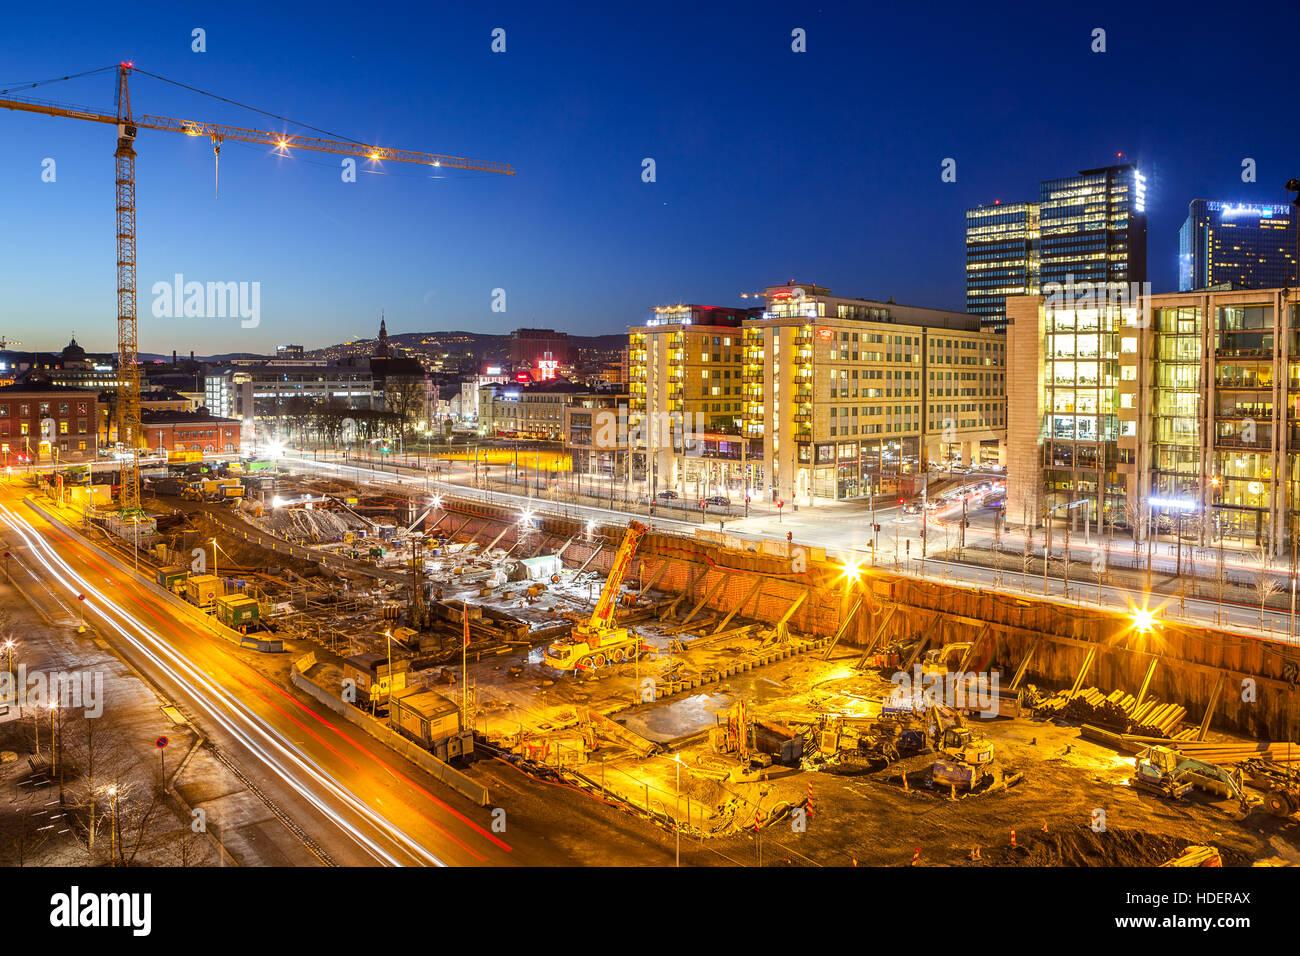 Bjorvika business quarter (Barcose). Construction of new buildings. - Stock Image